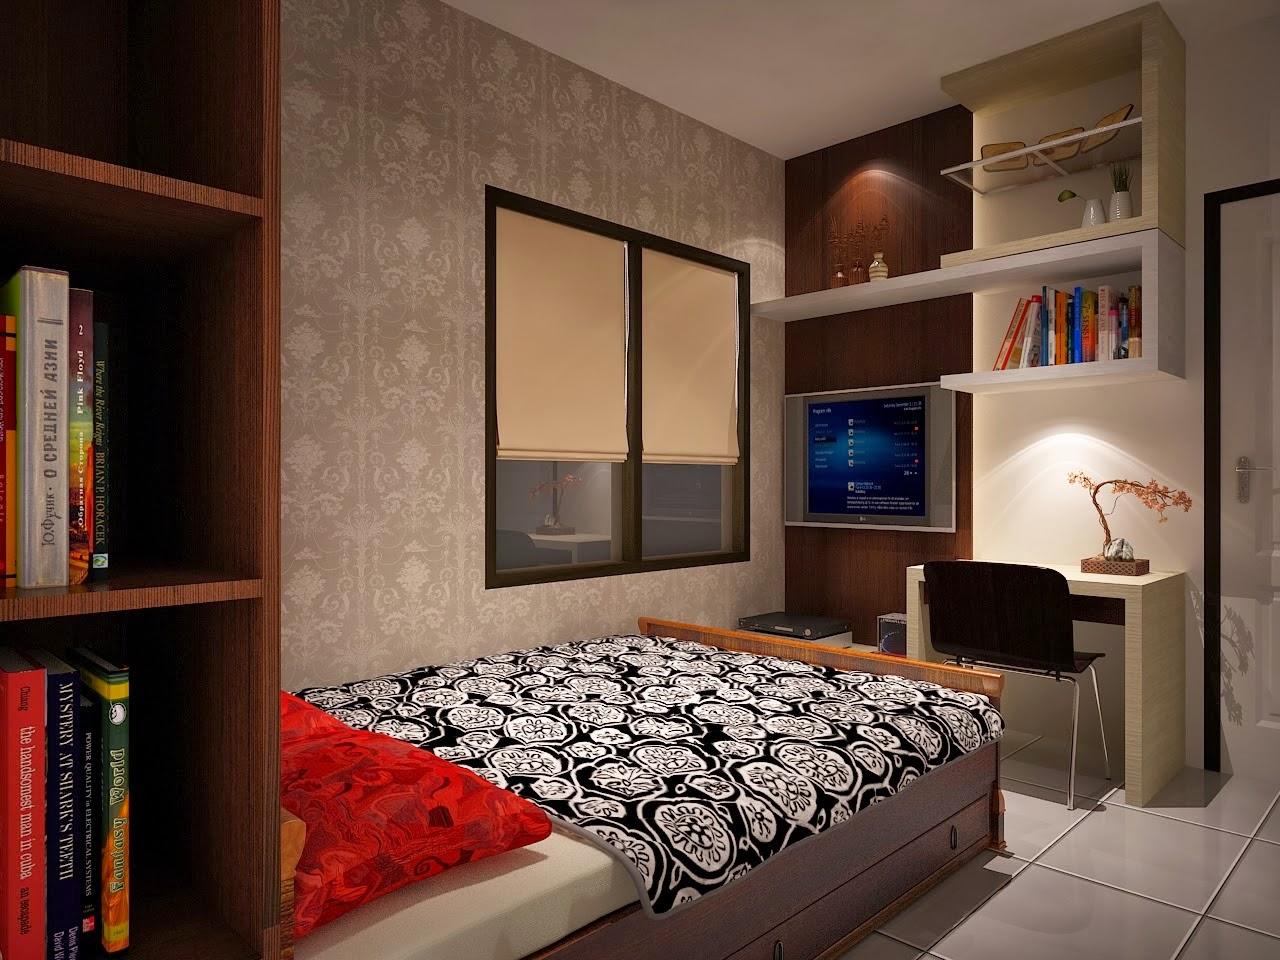 Interior Design Untuk Apartemen Desain Dapur Apartemen Idaman